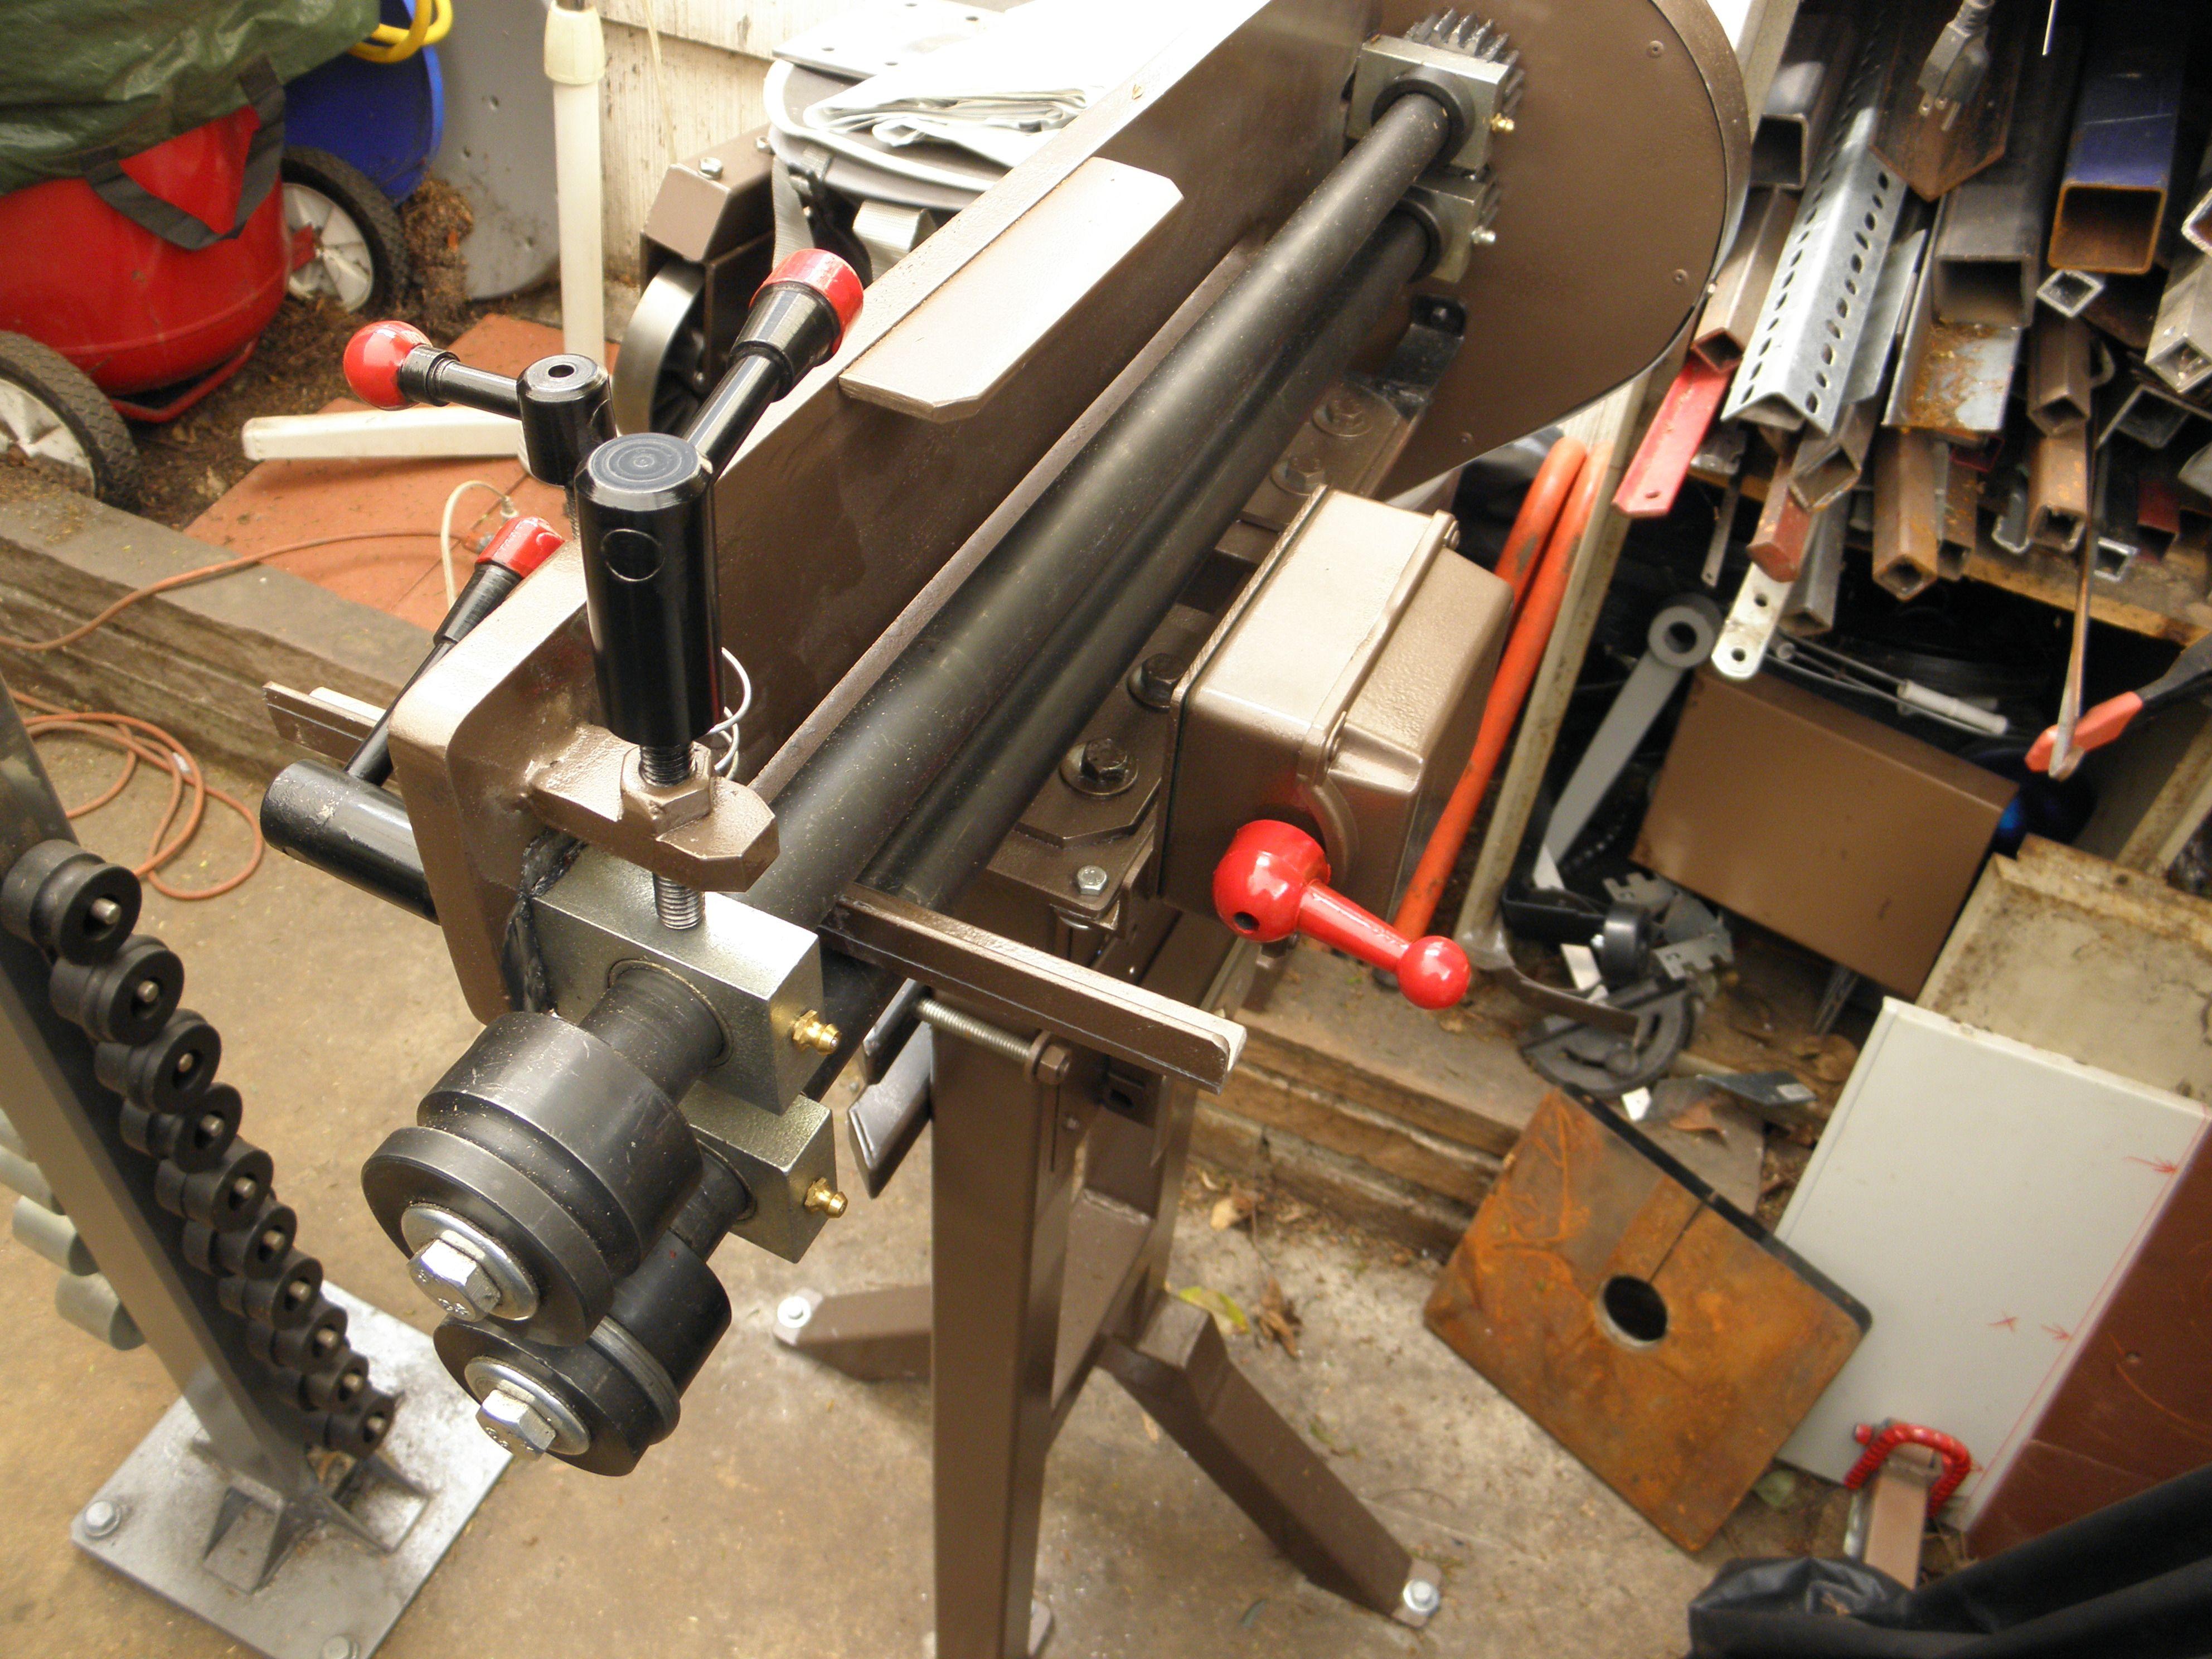 Bead roller diy | DIY TOOLS | Sheet metal tools, Metal tools